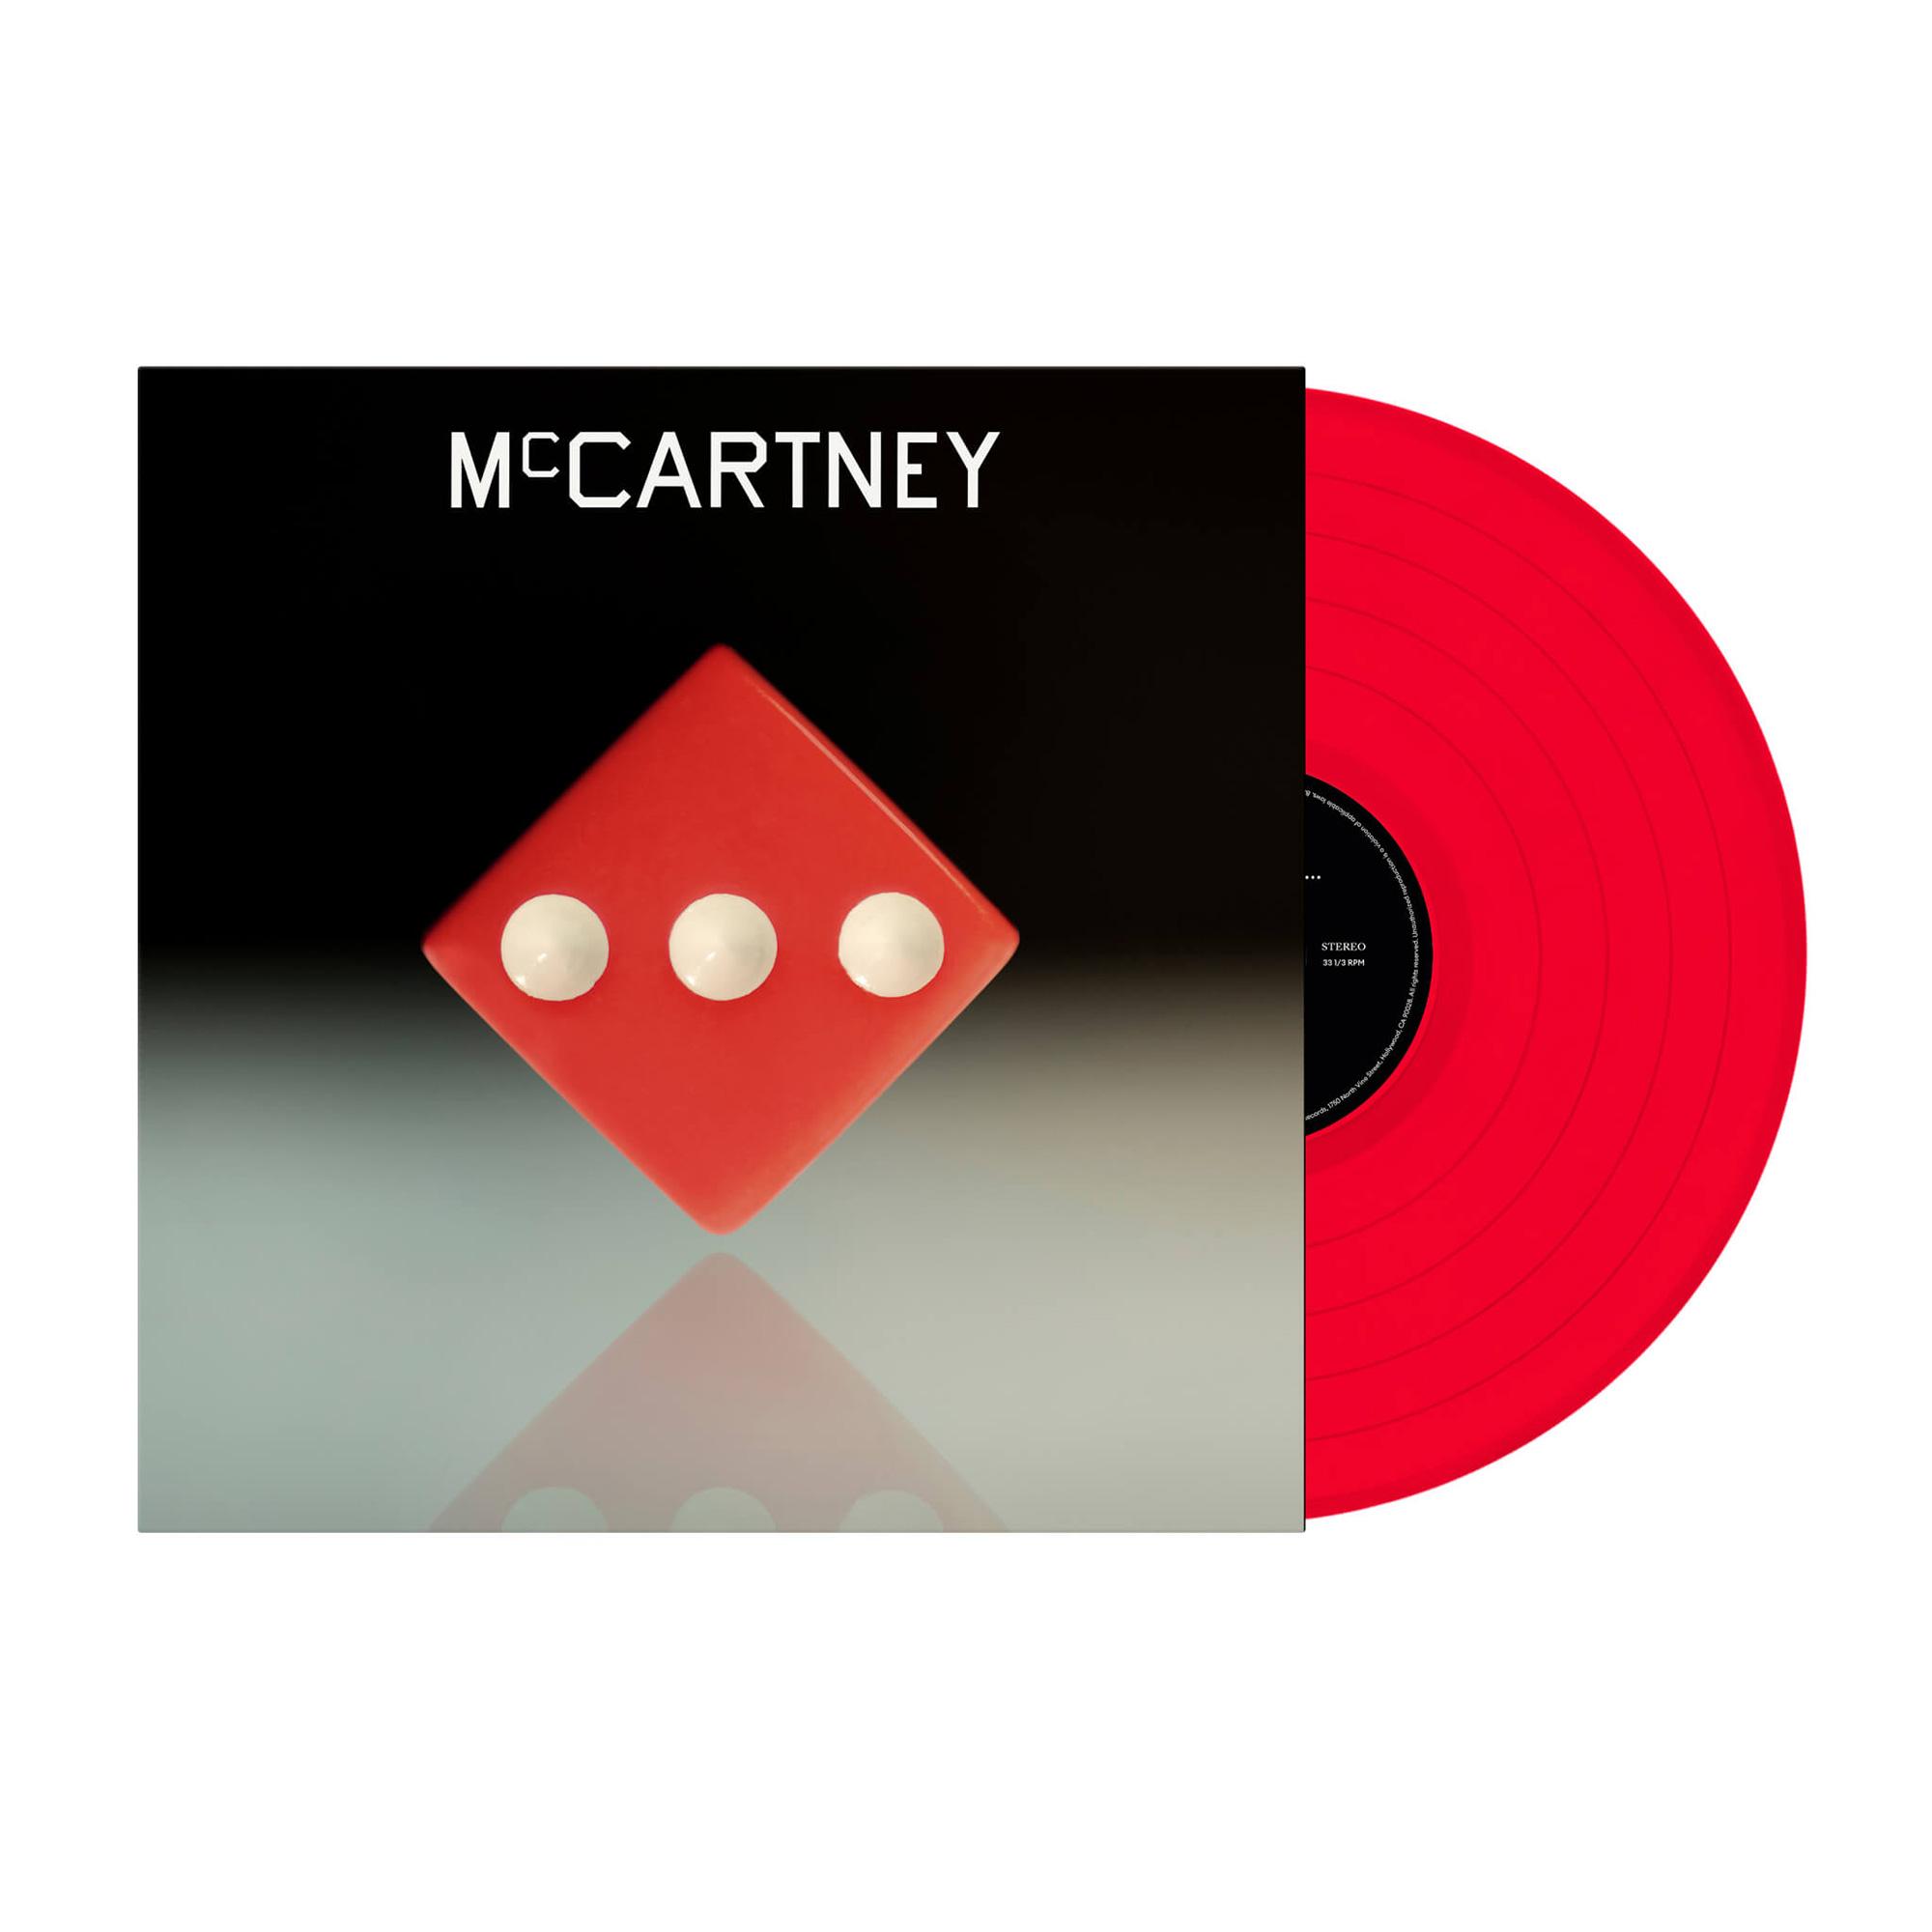 Bravado - III (Exclusive Red Vinyl) - Paul McCartney - LP